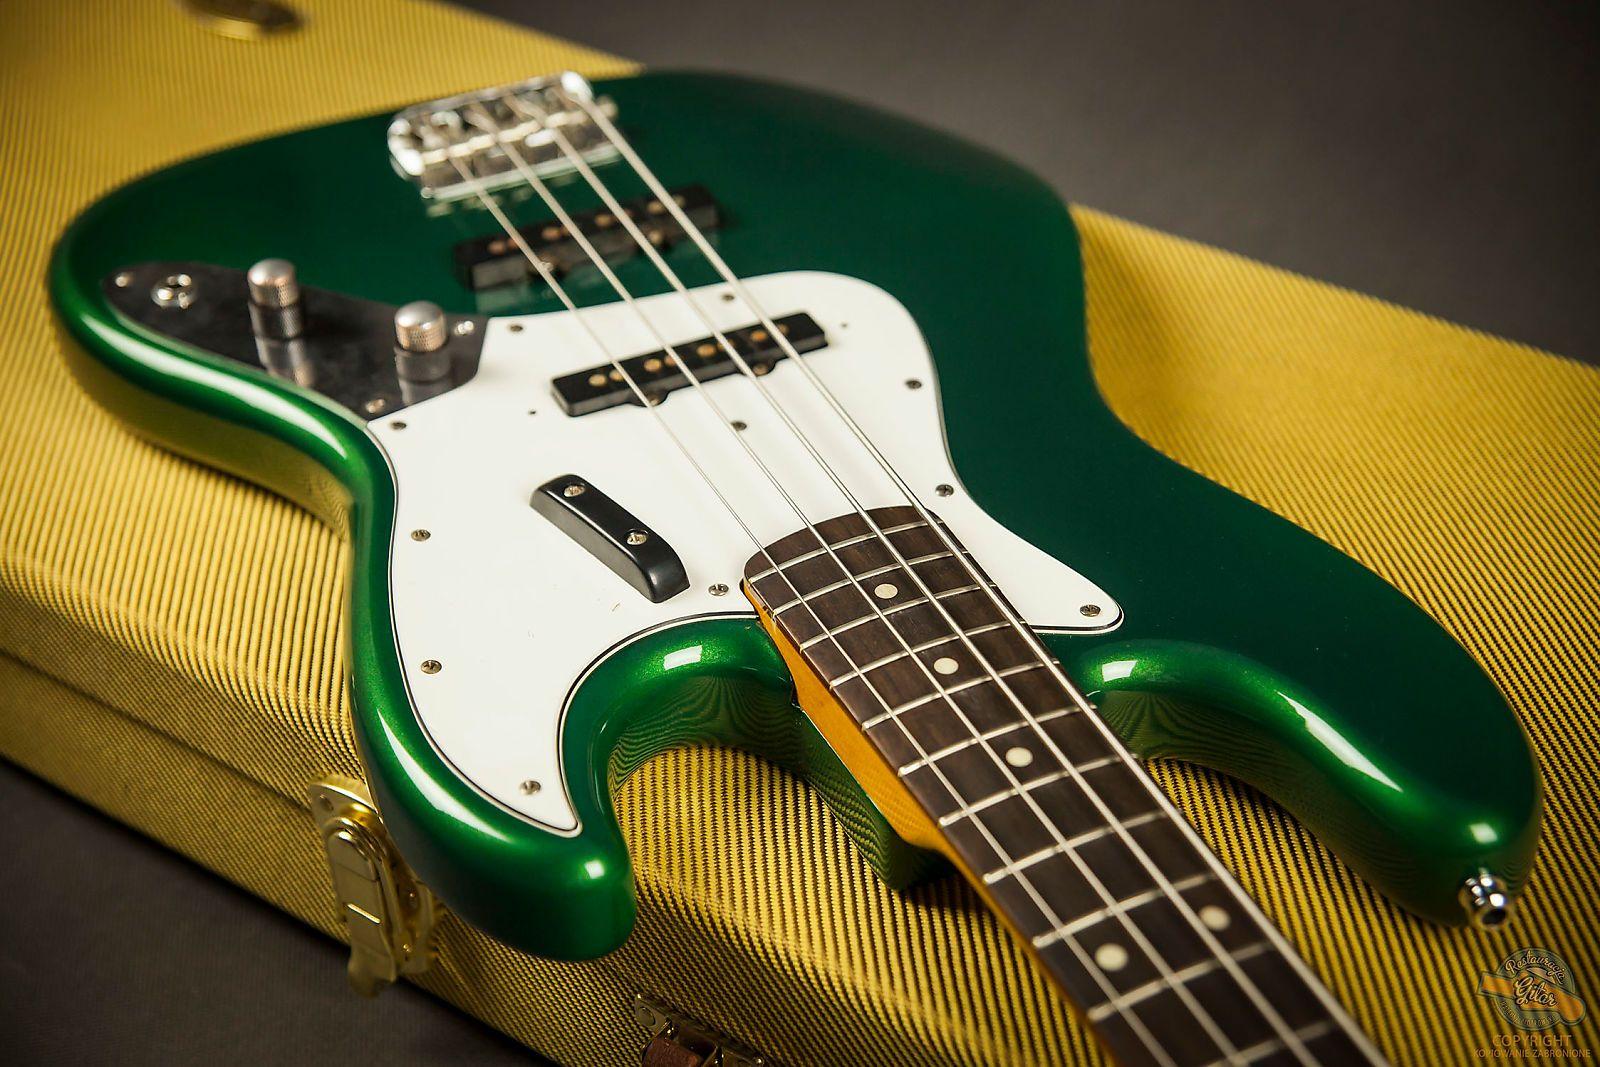 Fender custom 61 jazz bass closet classic 1993 candy